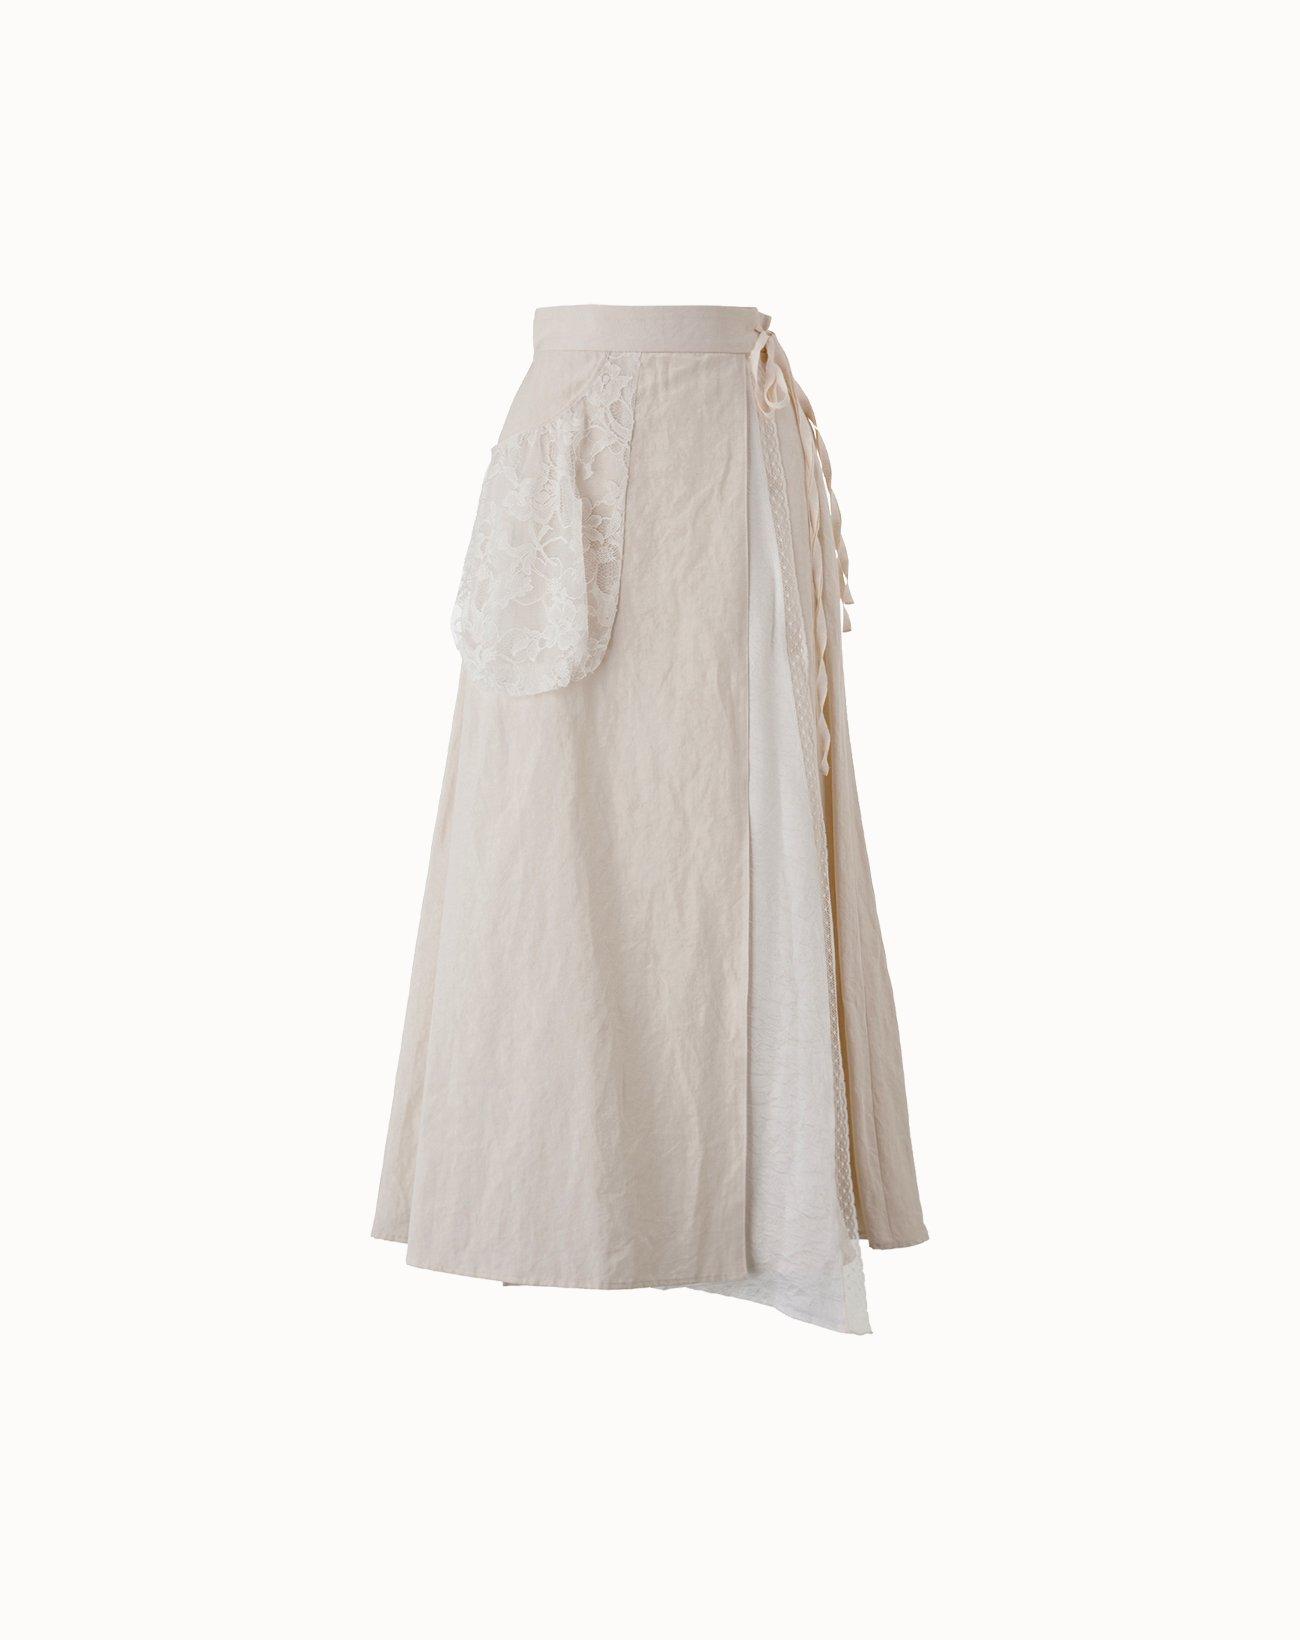 leur logette - Vintage Linen Skirt - Off-White